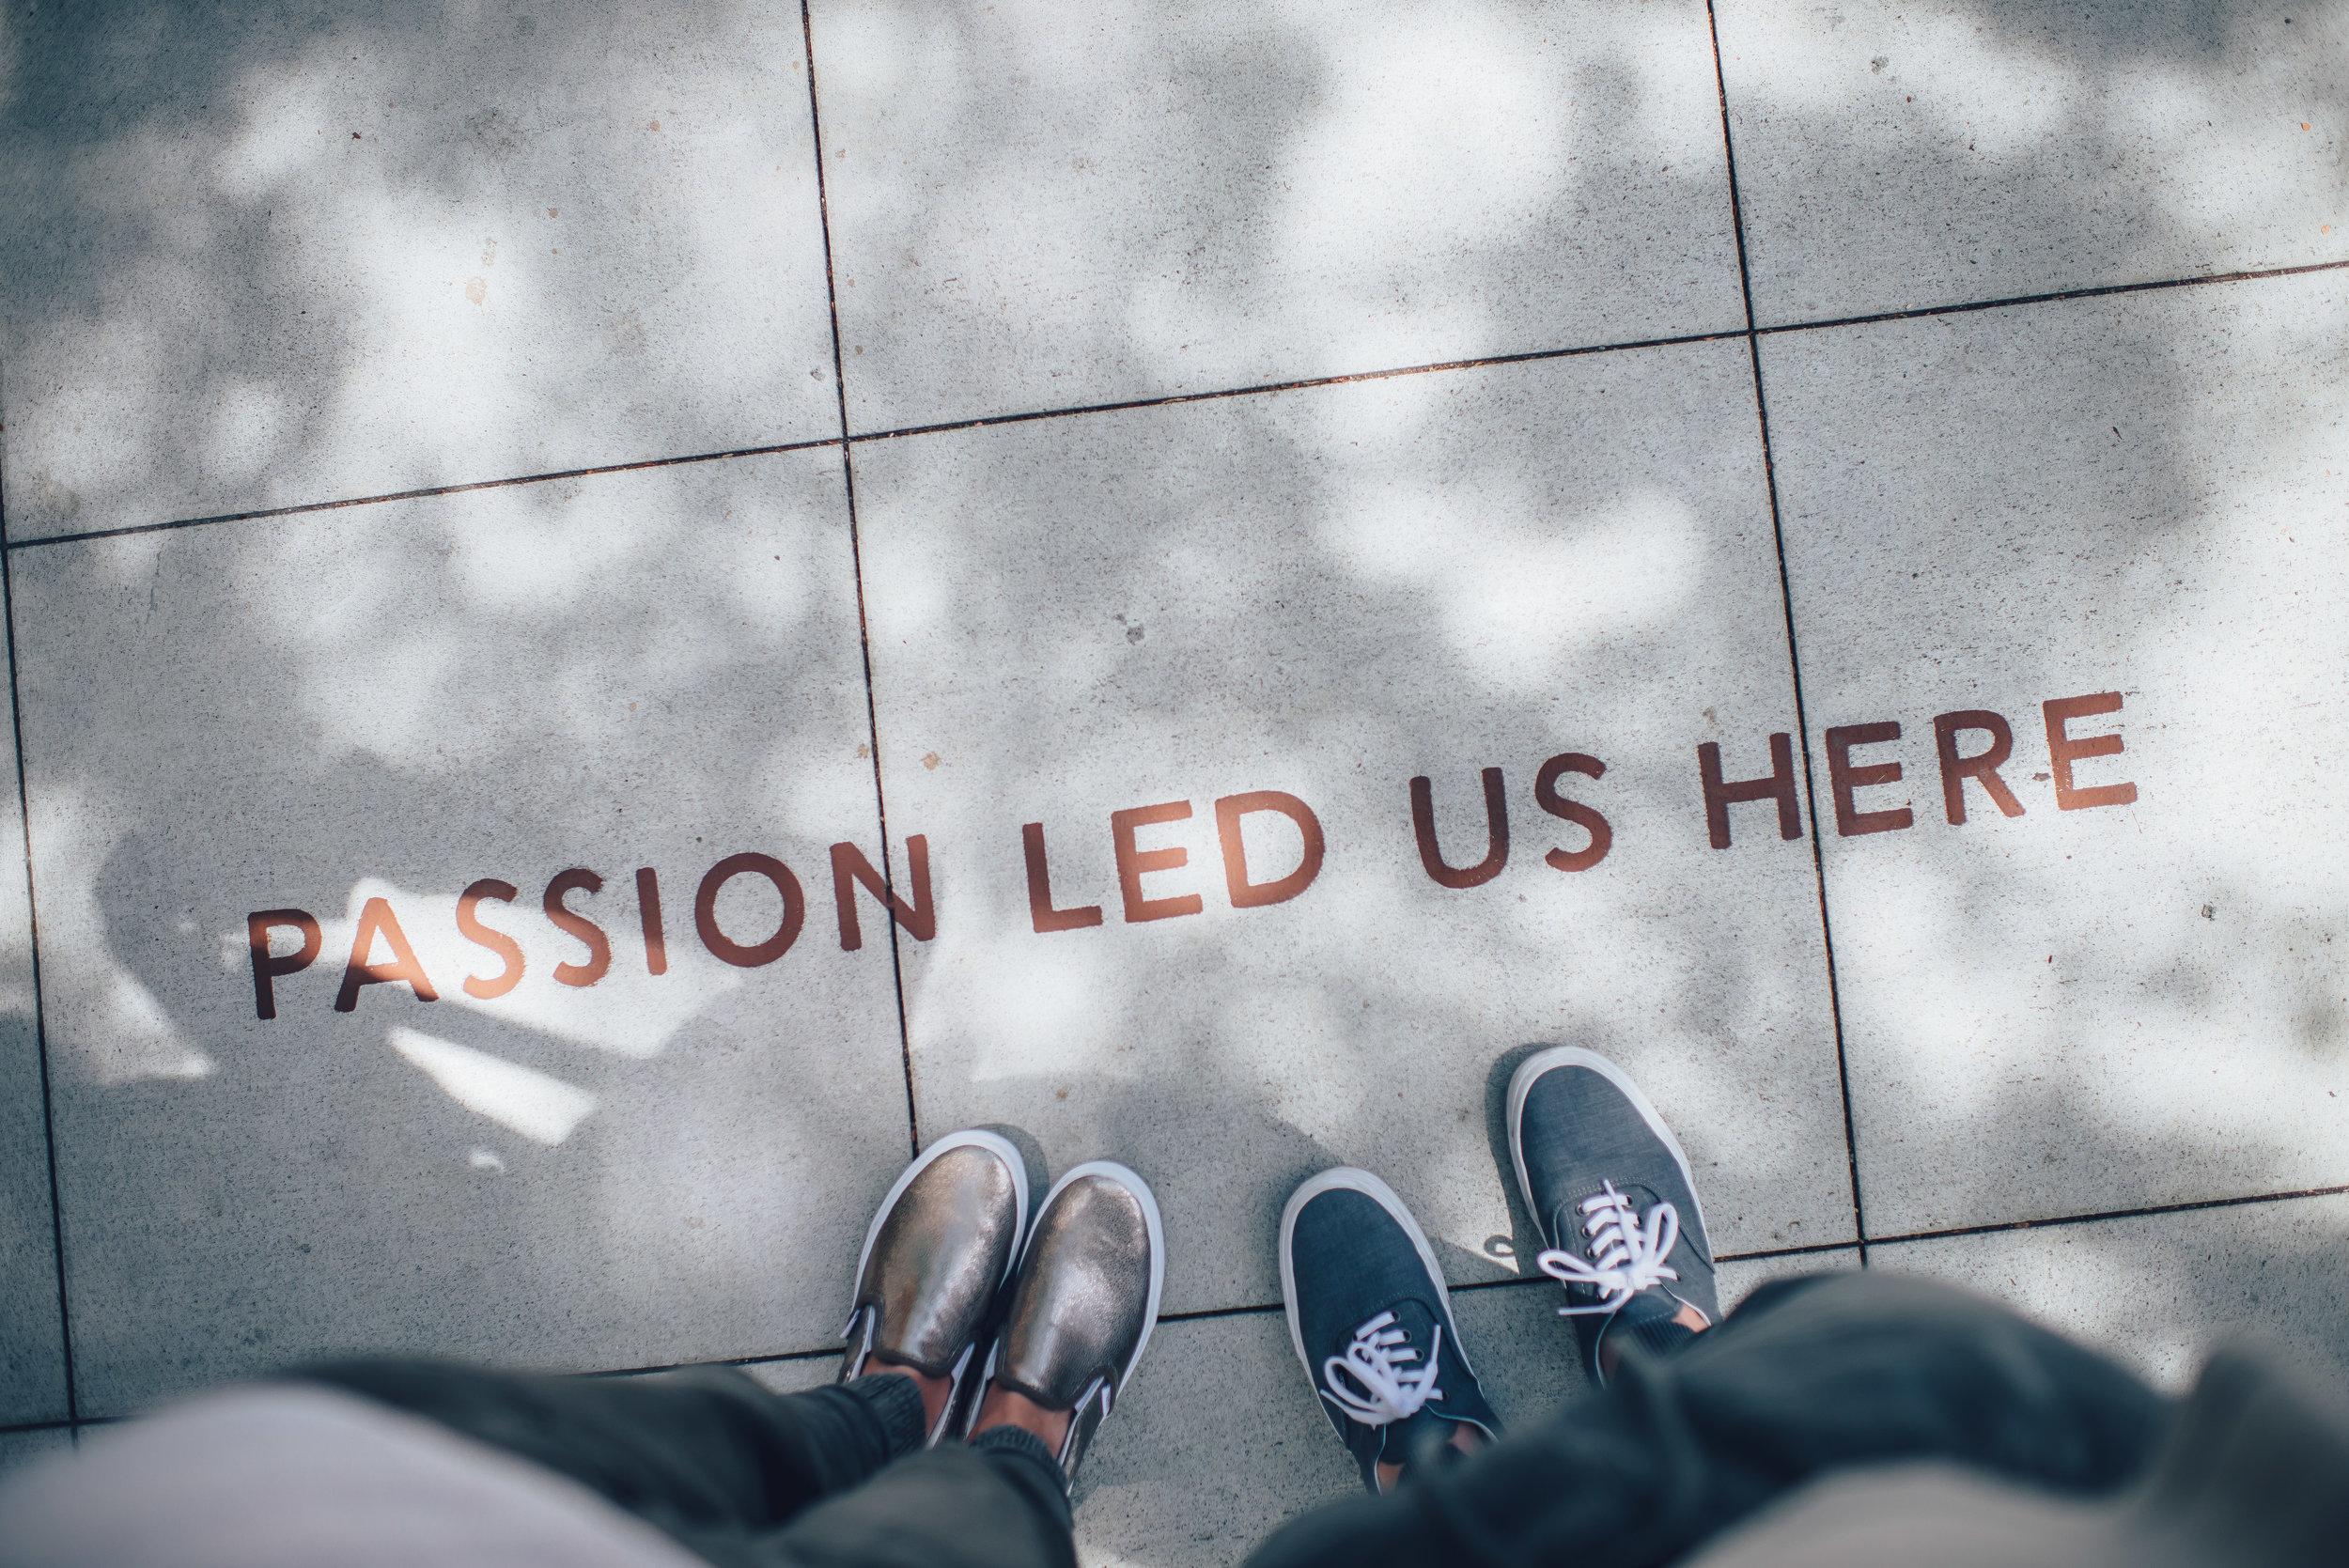 Passion on sidewalk.